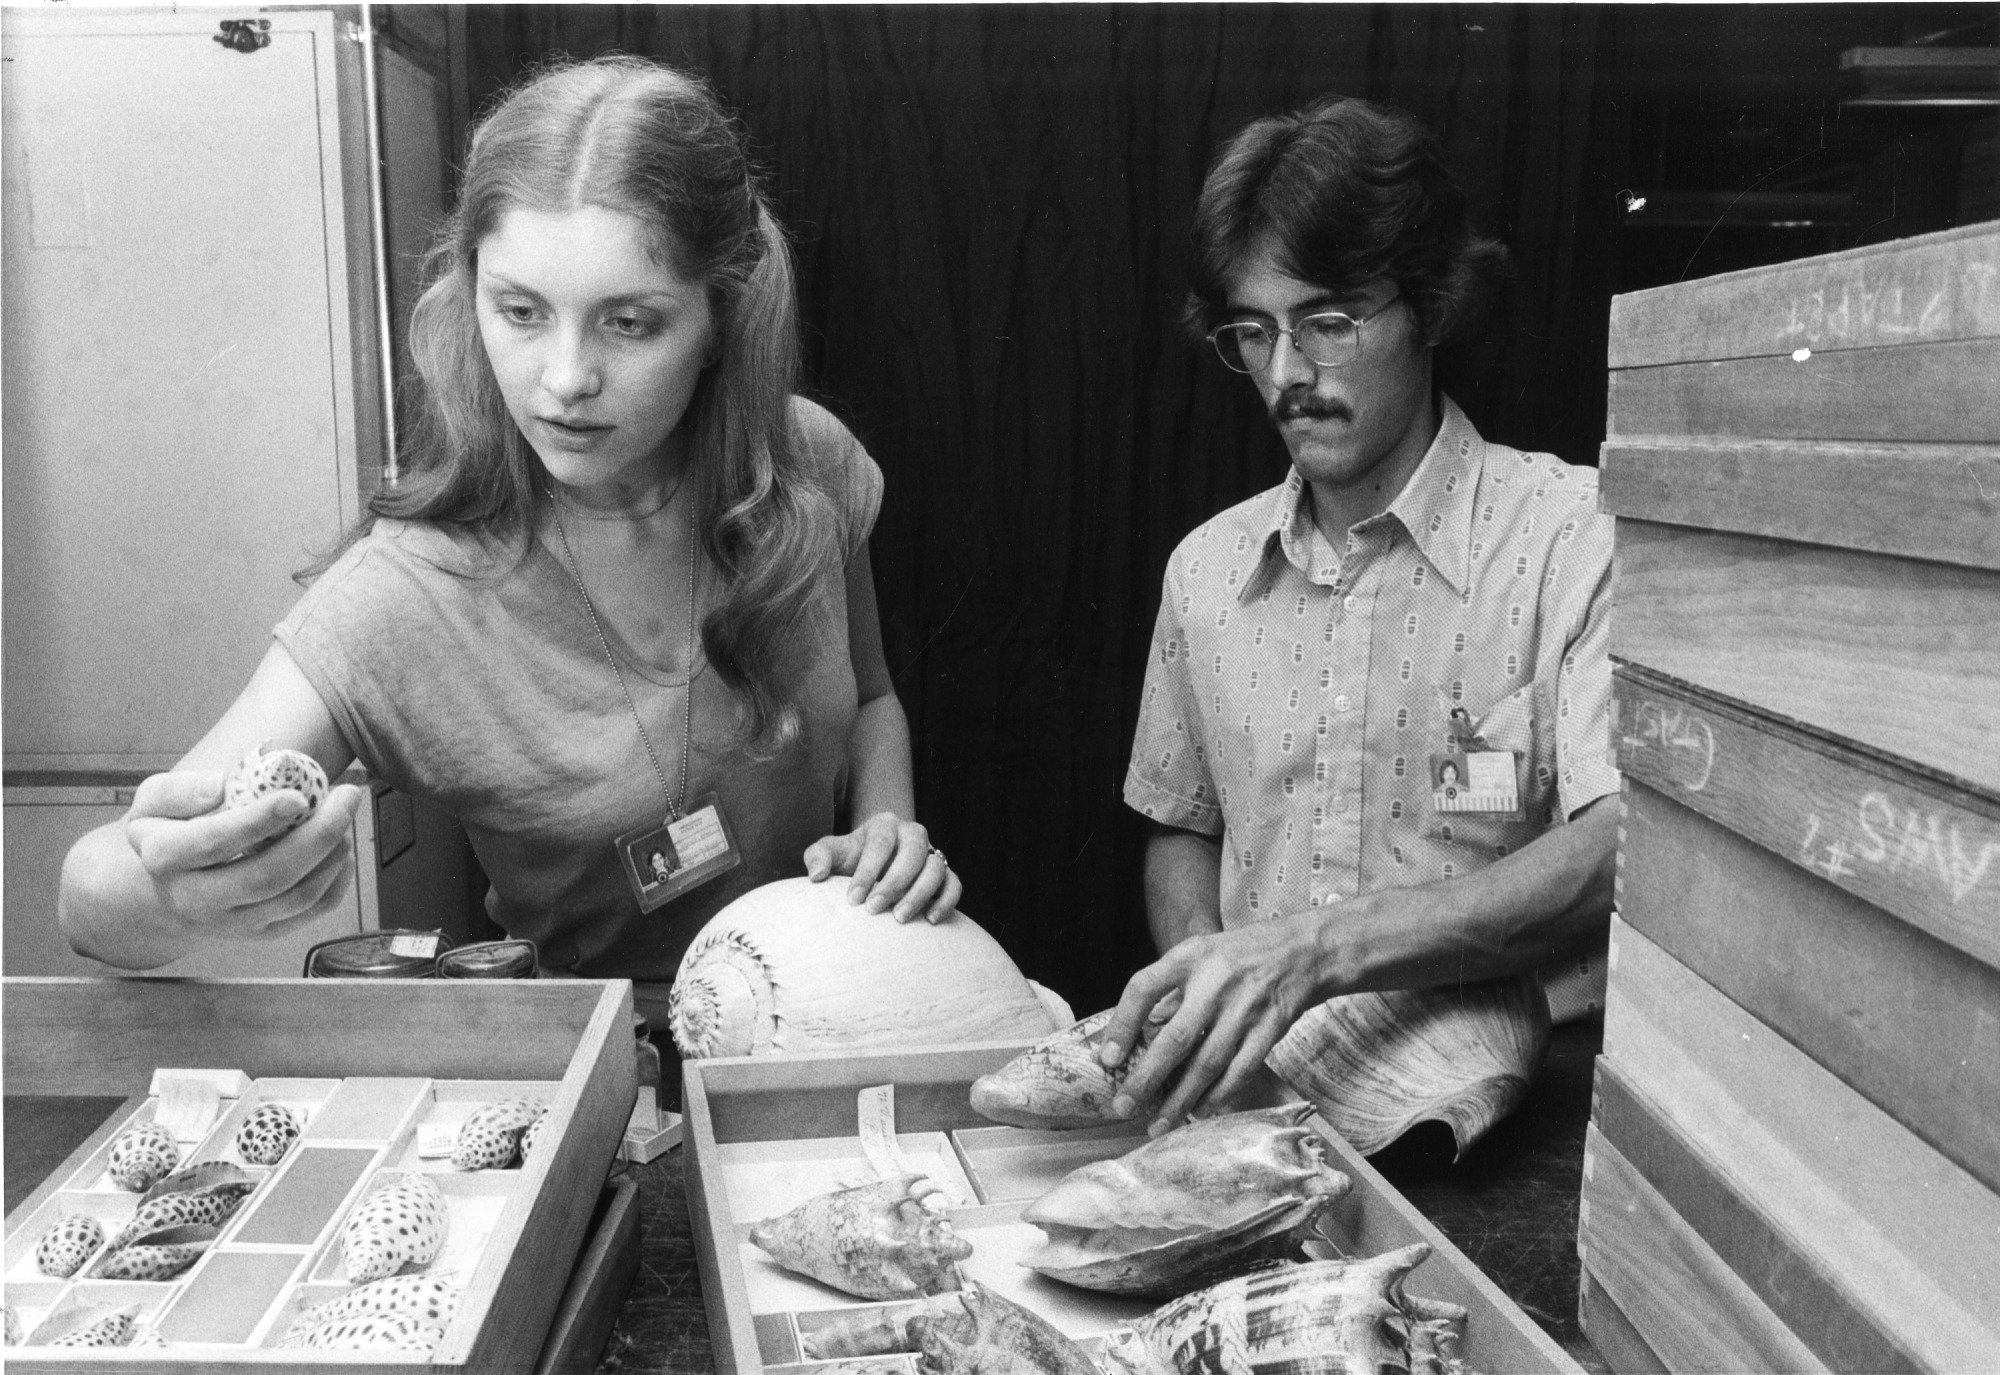 Deborah Bennett and Tim Coffer with Mollusks, 1979